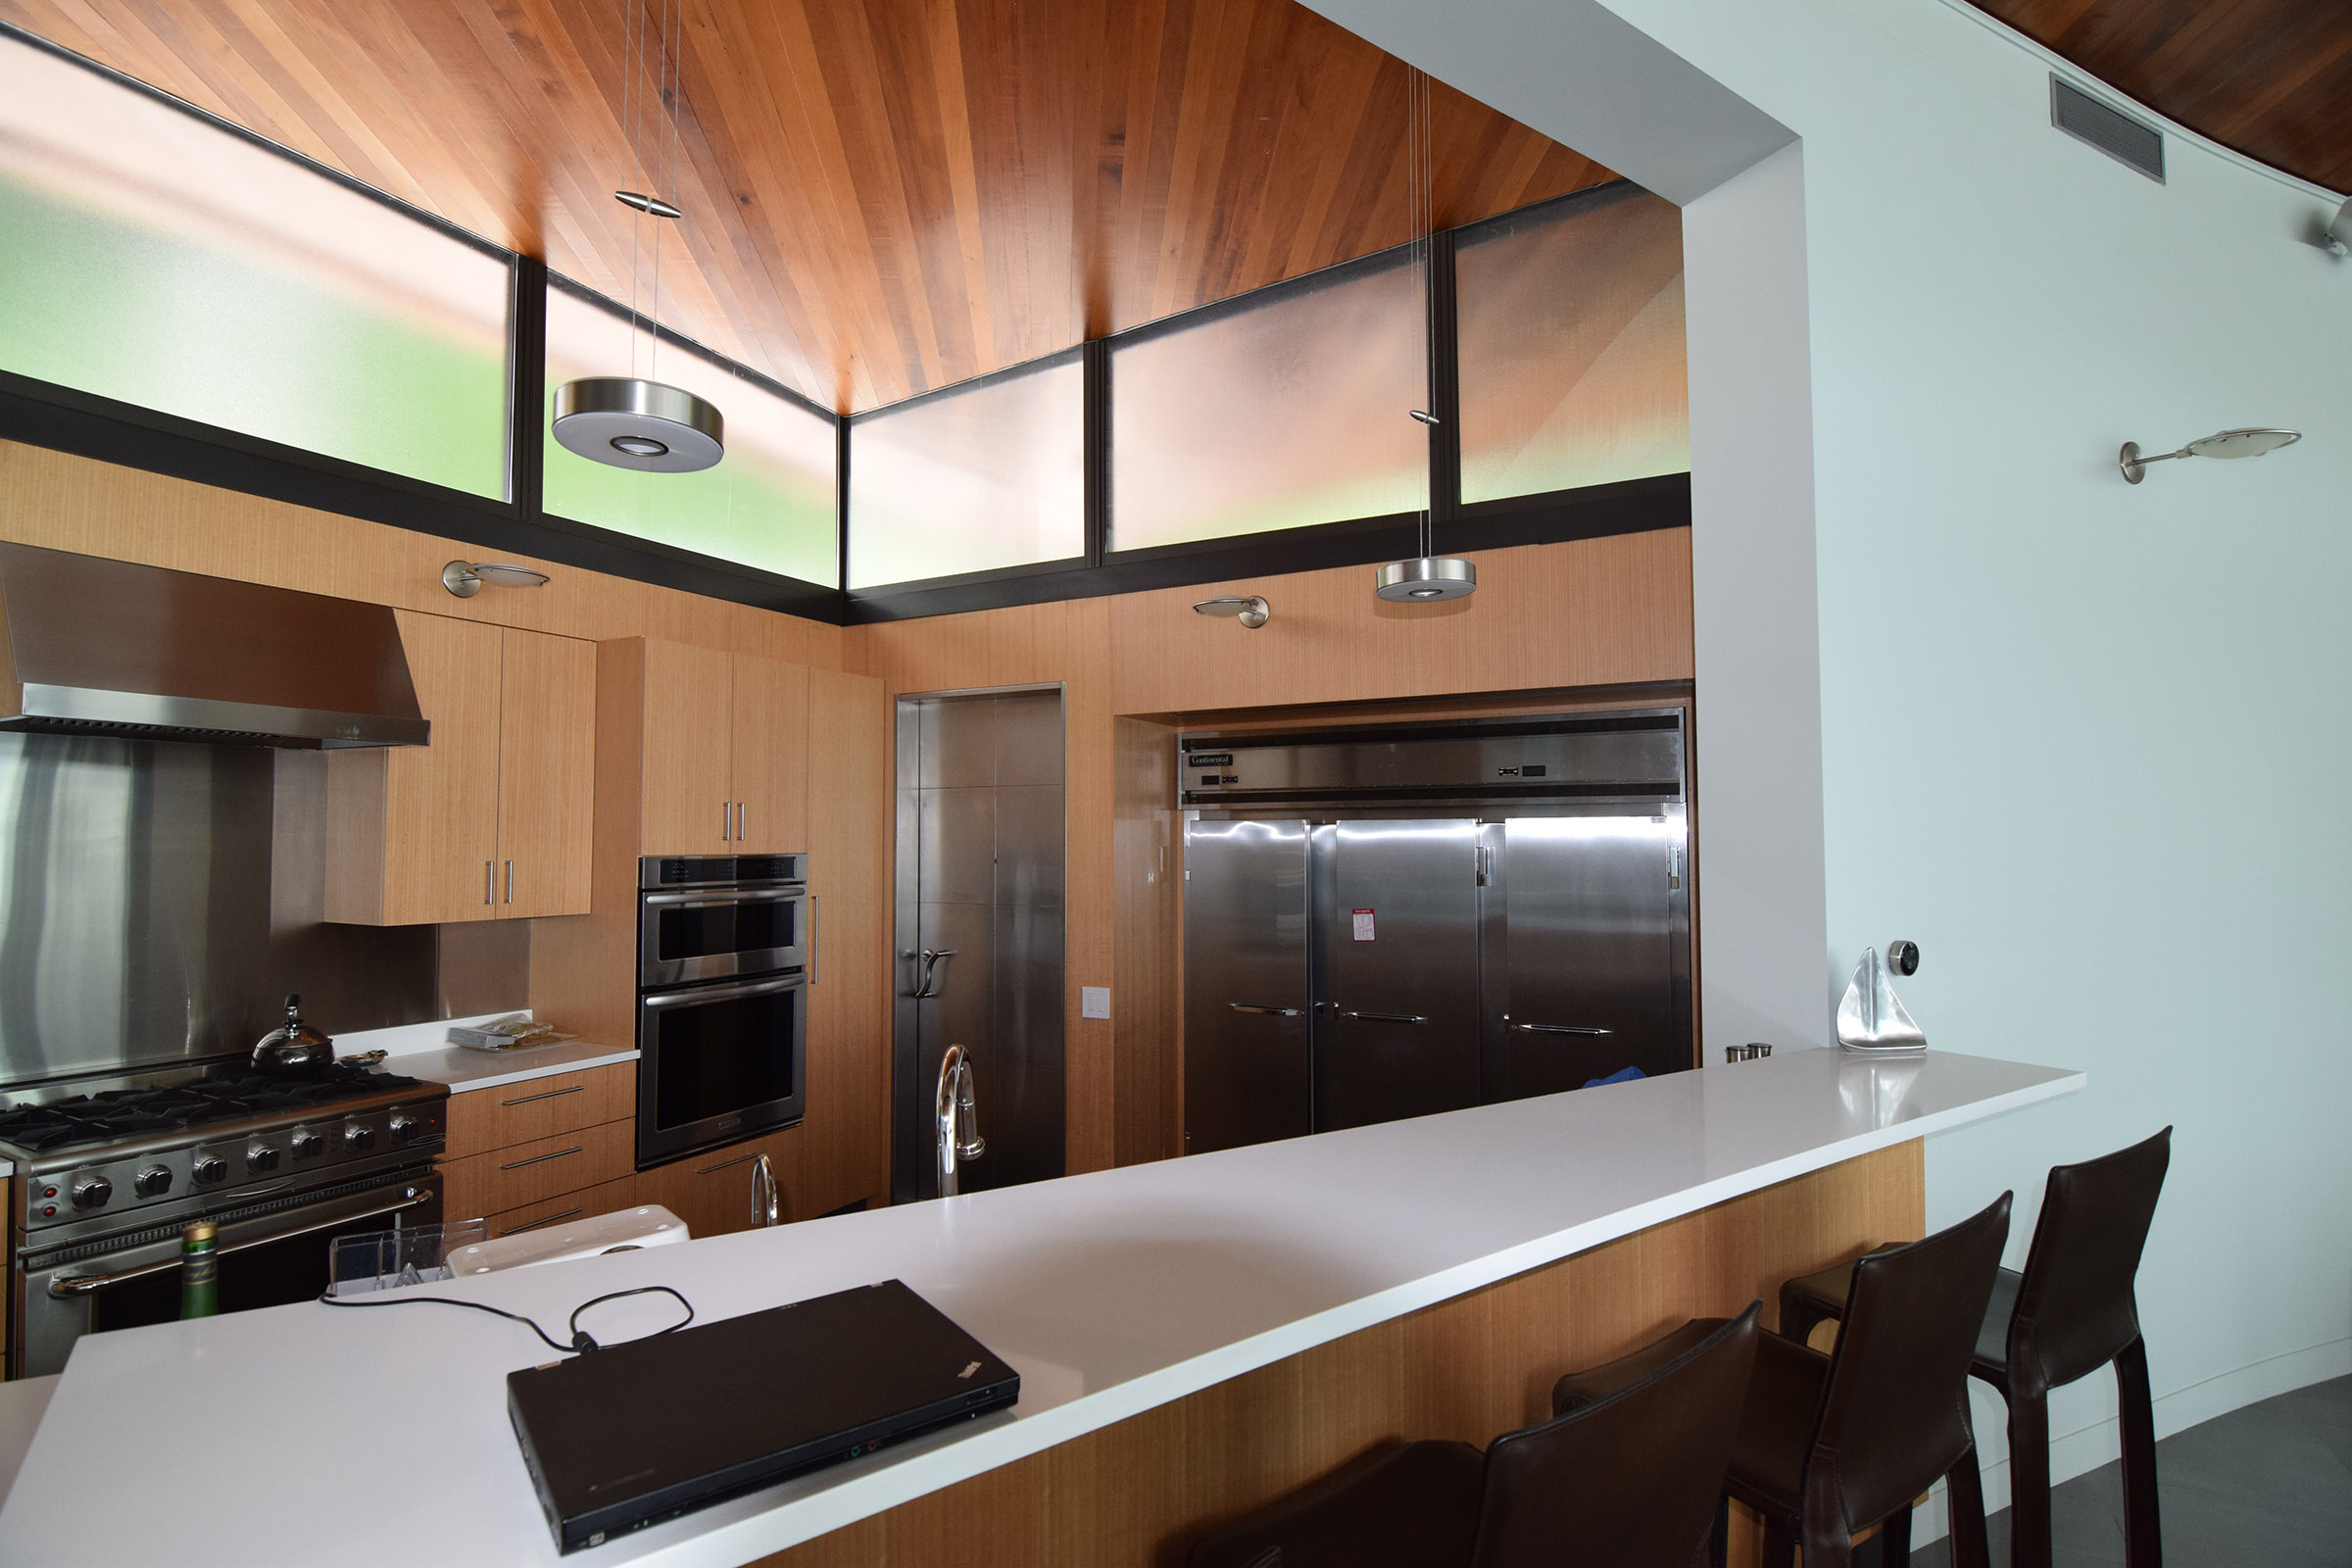 Rift Anigre Custom Kitchen Cabinets & Breakfast Counter Paneling